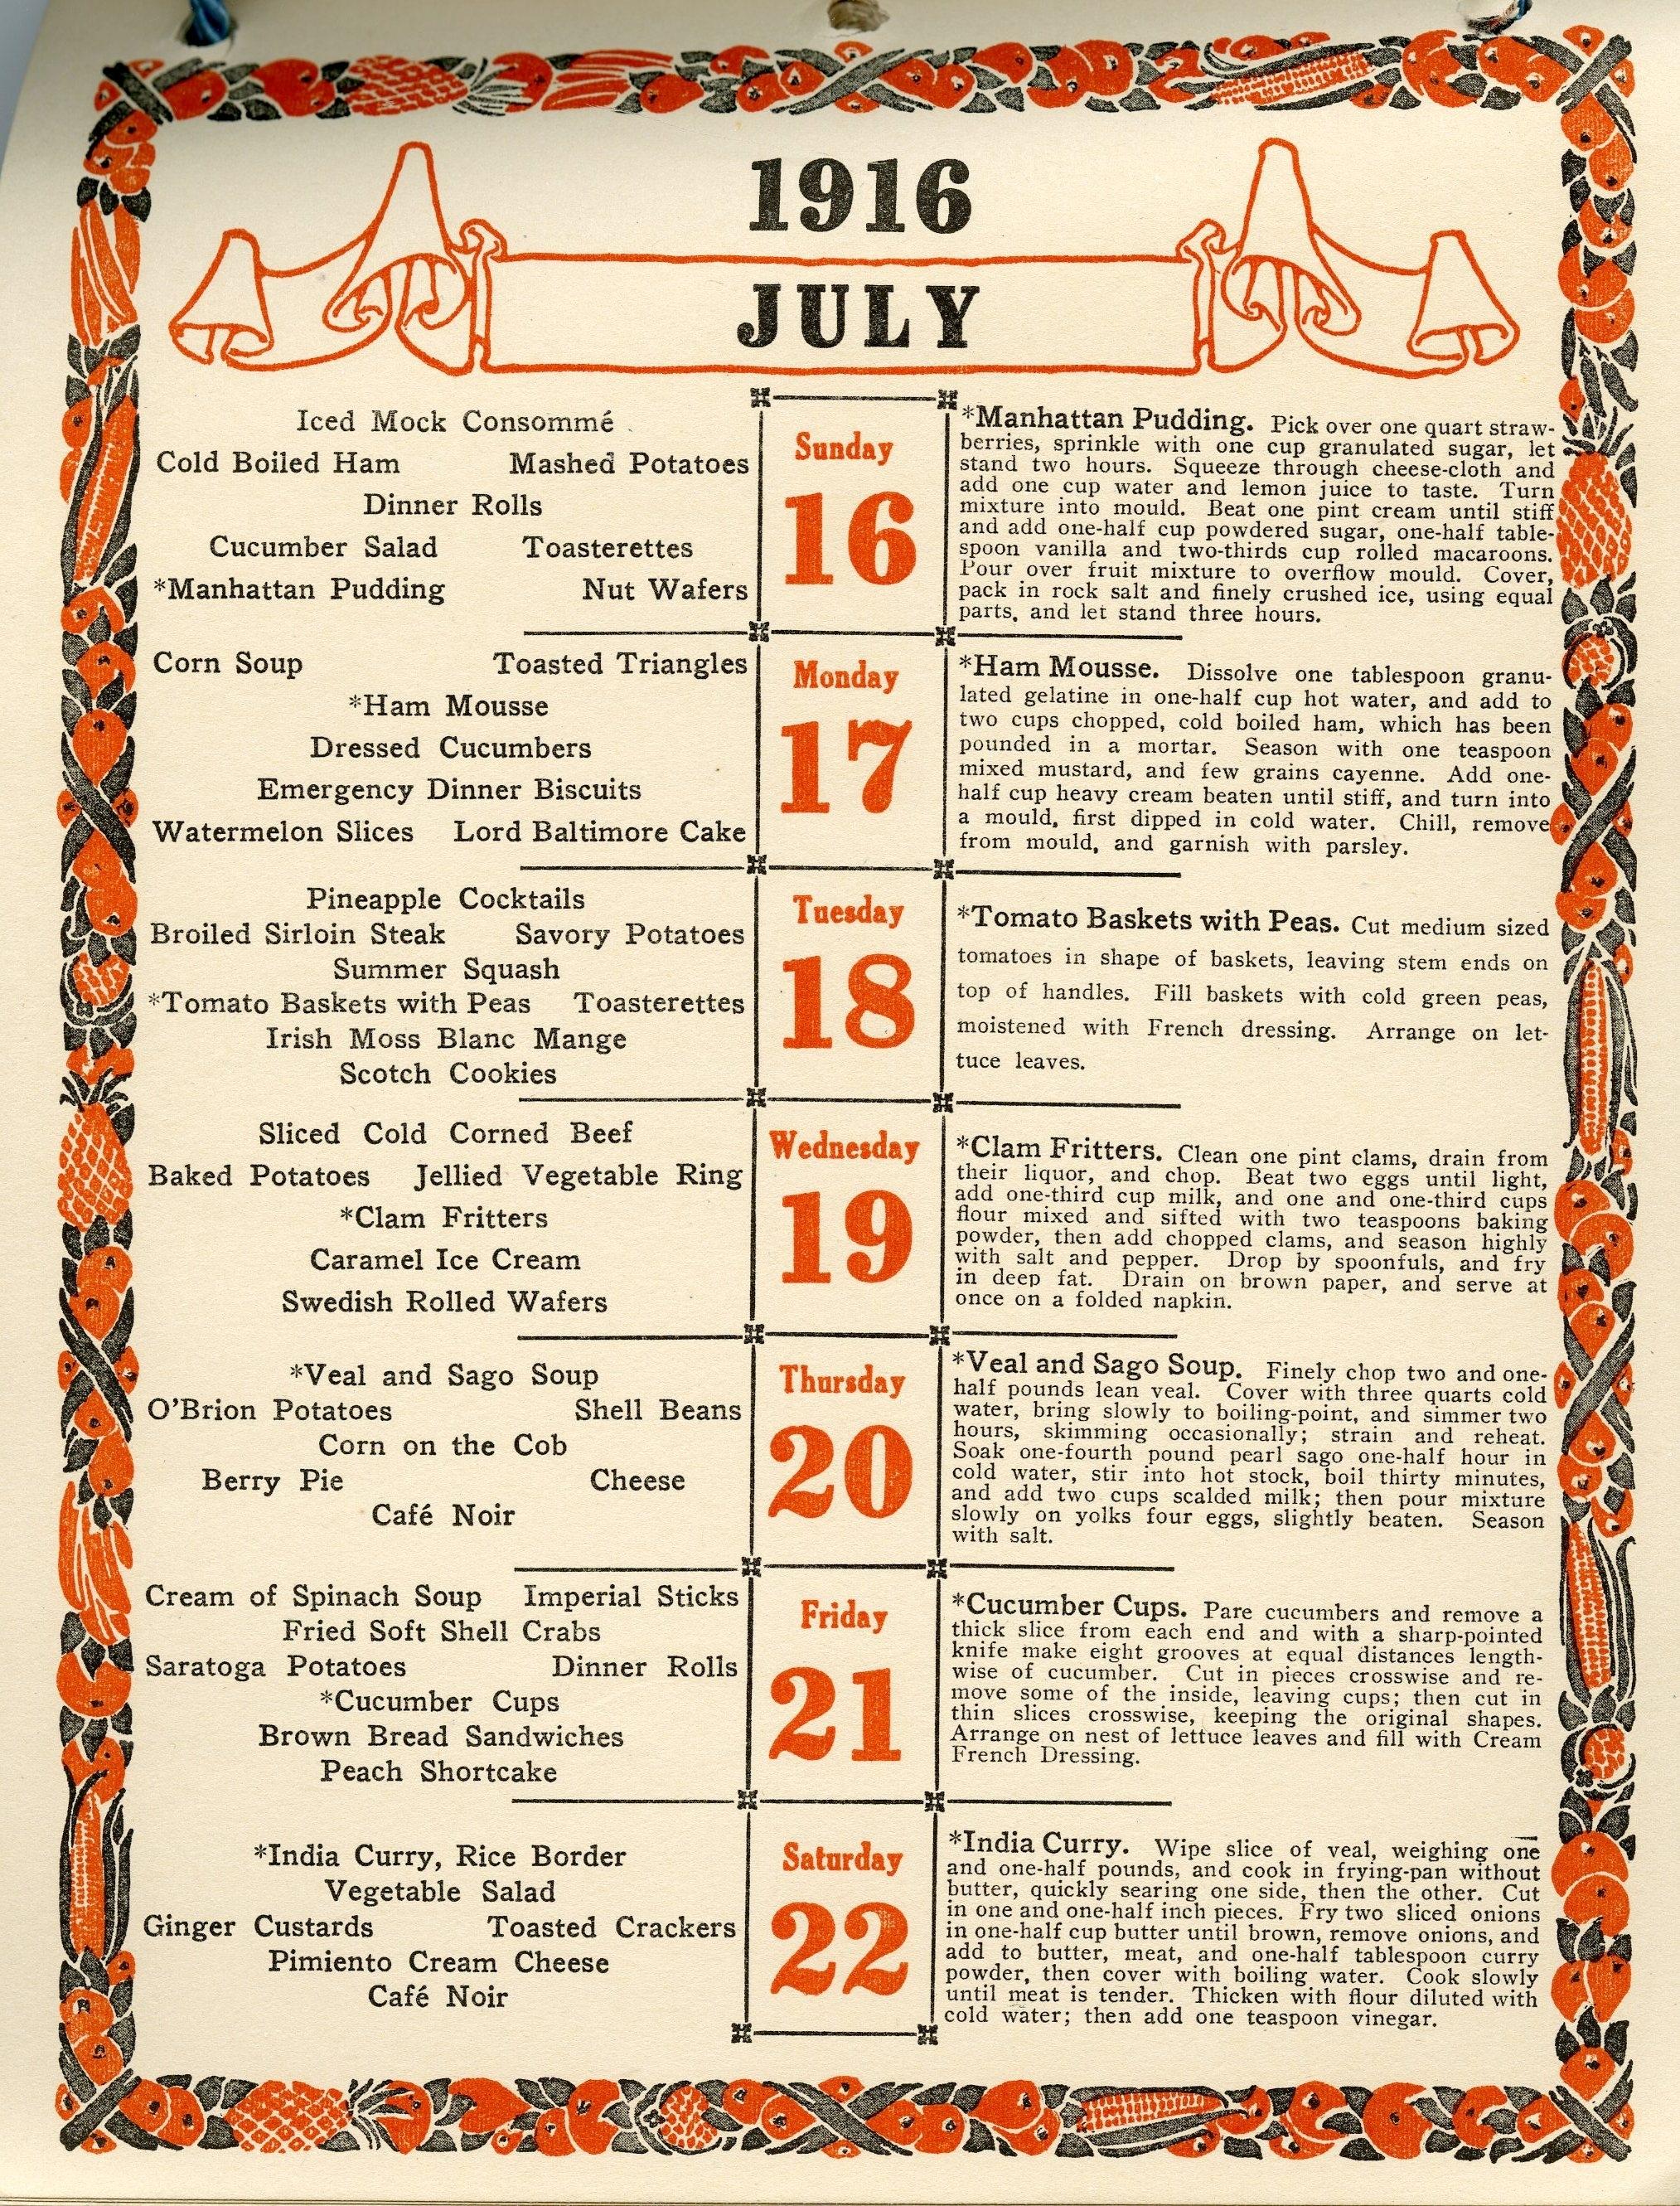 A Week Of Dinners From Fannie Farmer's 1916 Calendar [X-Post /r